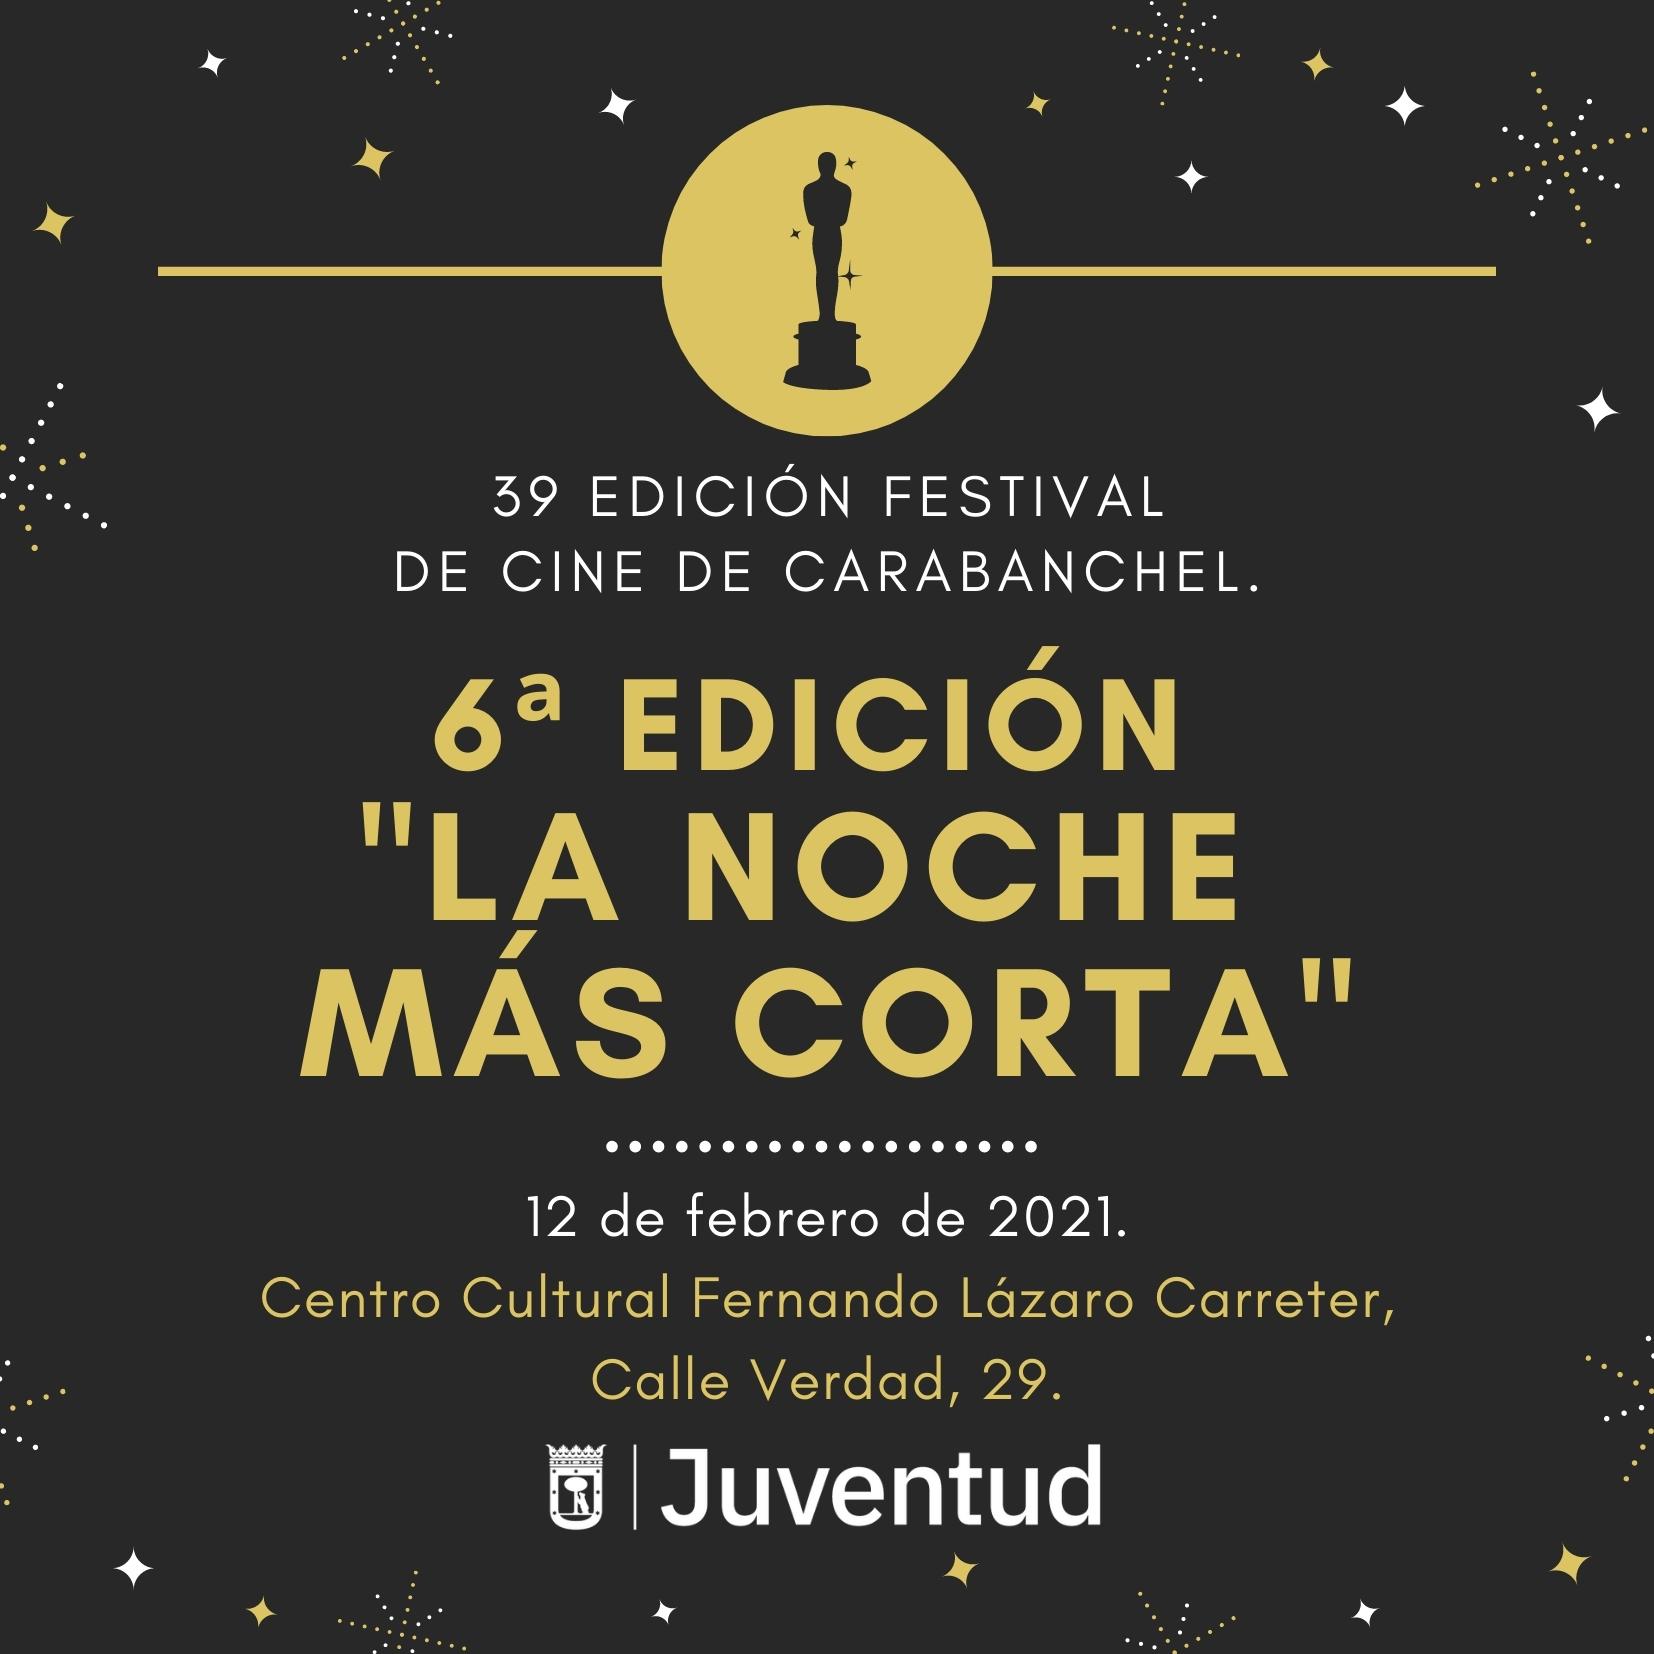 Festival de cortometrajes la noche mas corta-la-noche-mas-corta-1.jpg